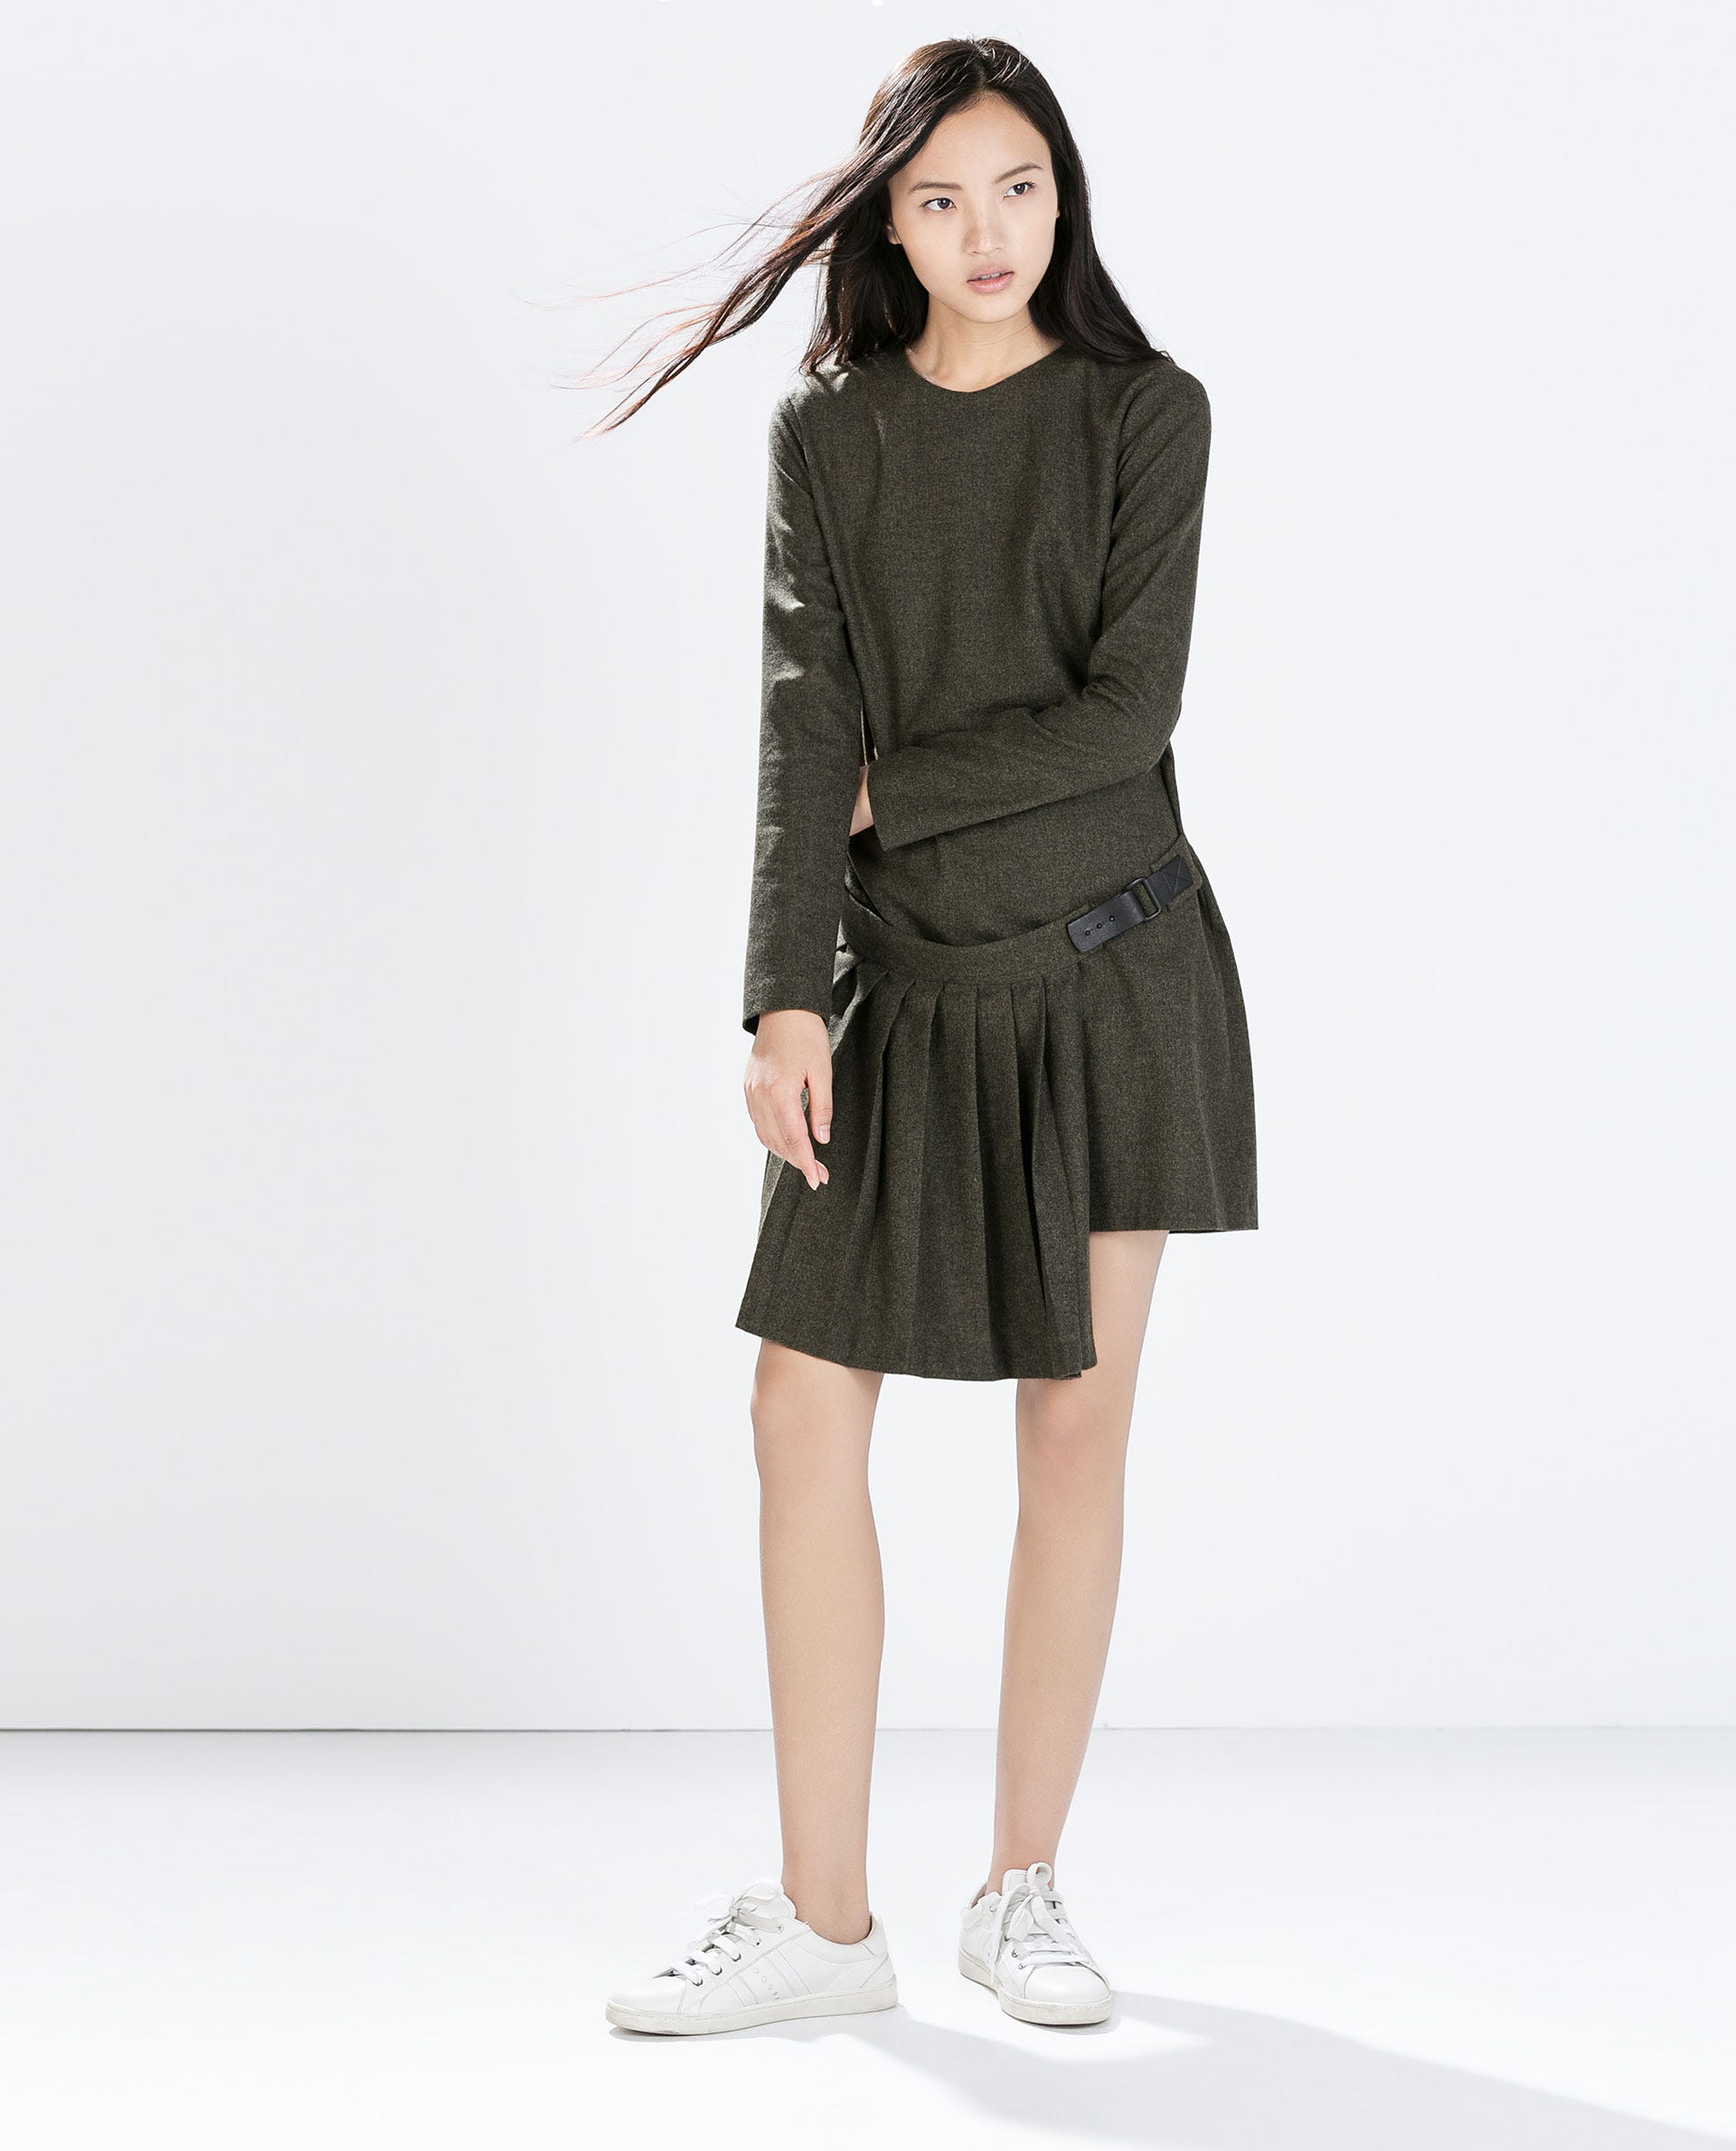 259ac12b4 Long-Sleeve Dresses - Winter